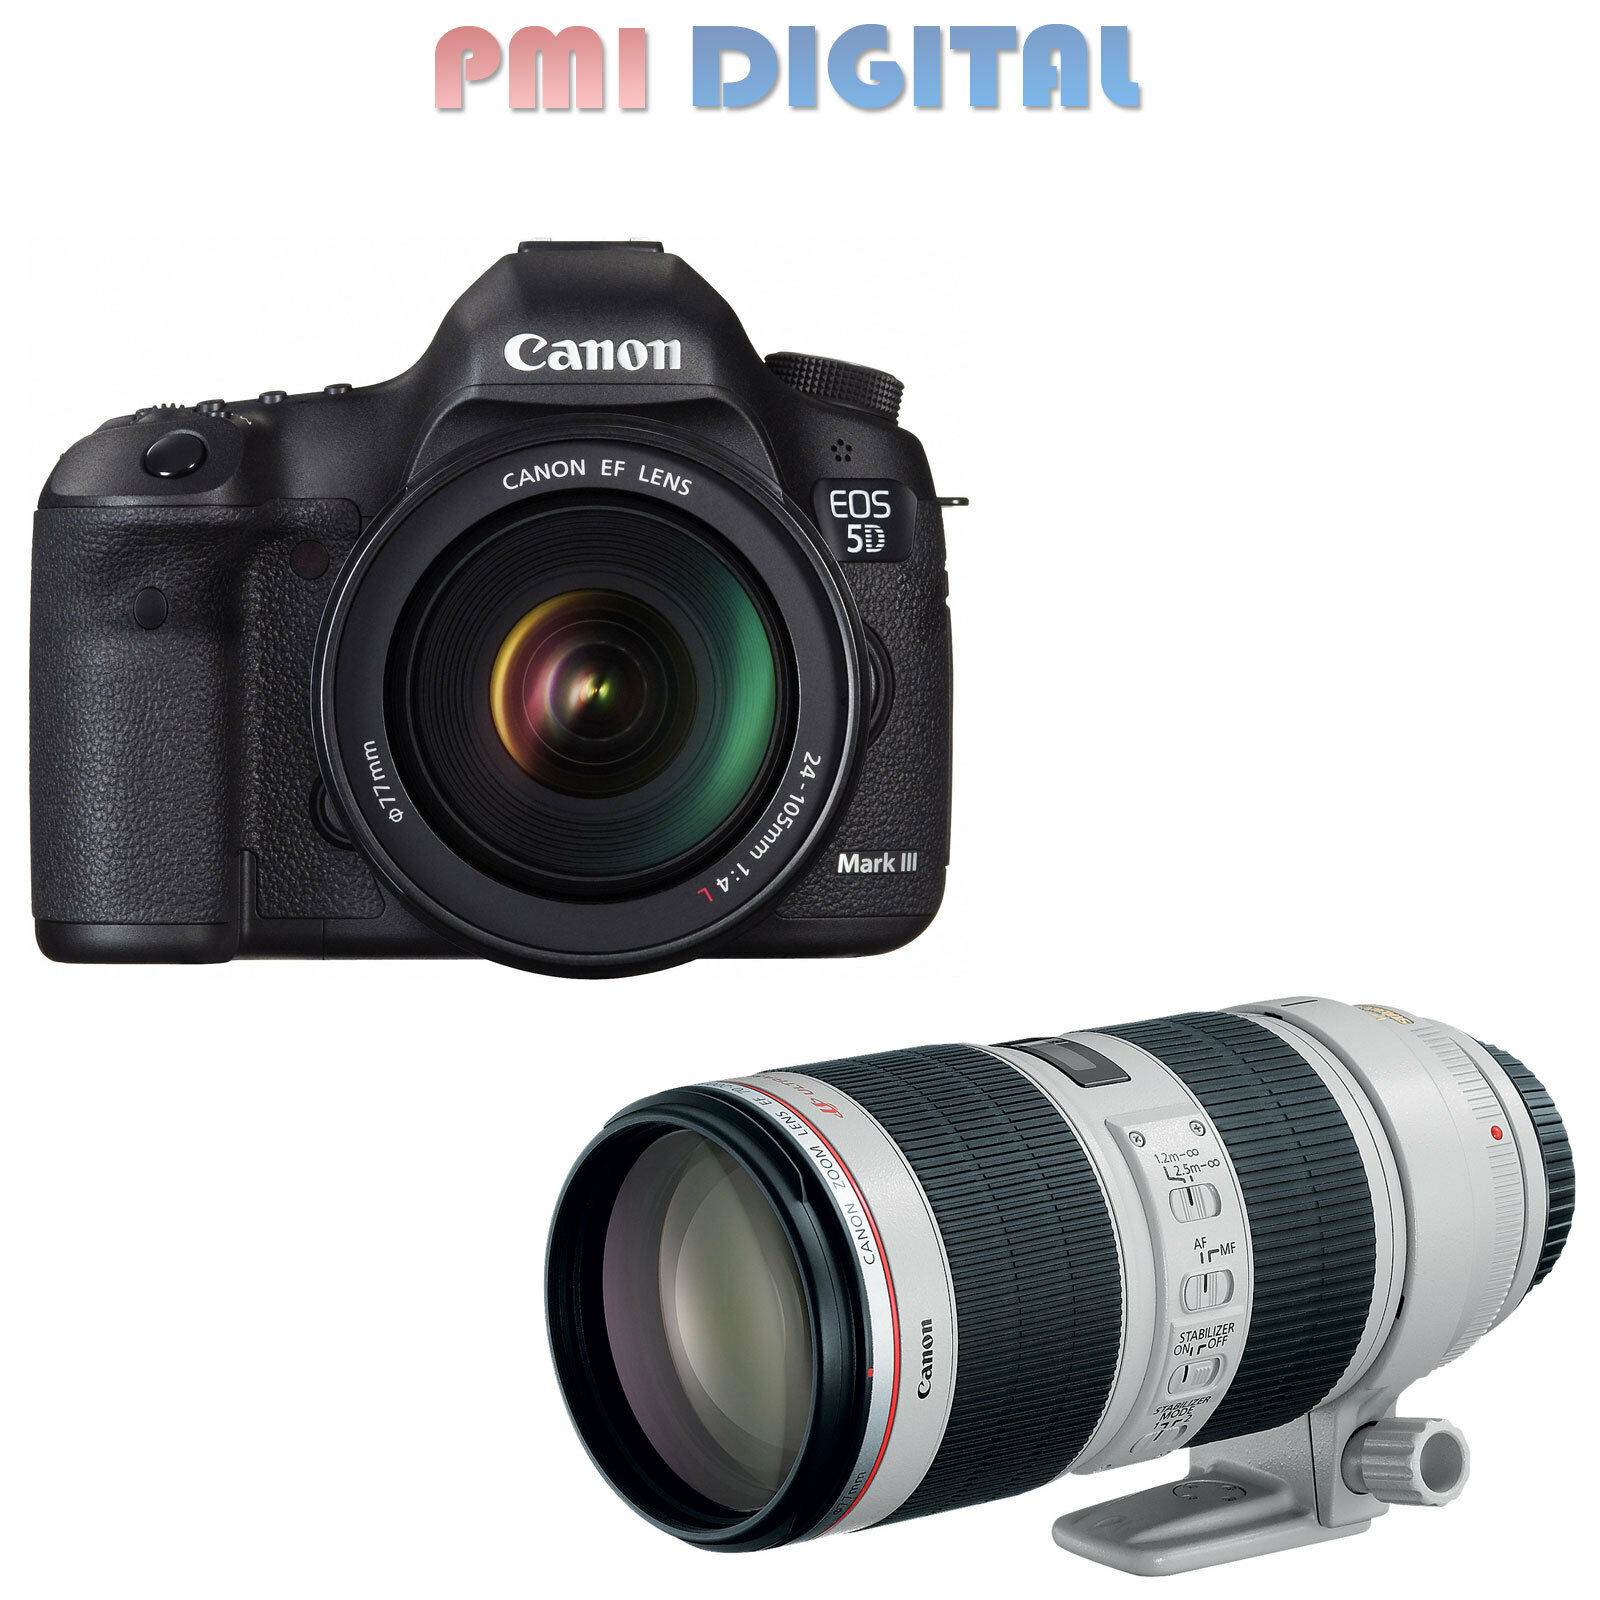 Canon eos 5d mark iii body canon ef 70 200mm f 2 8 l is ii for 5d mark iii body